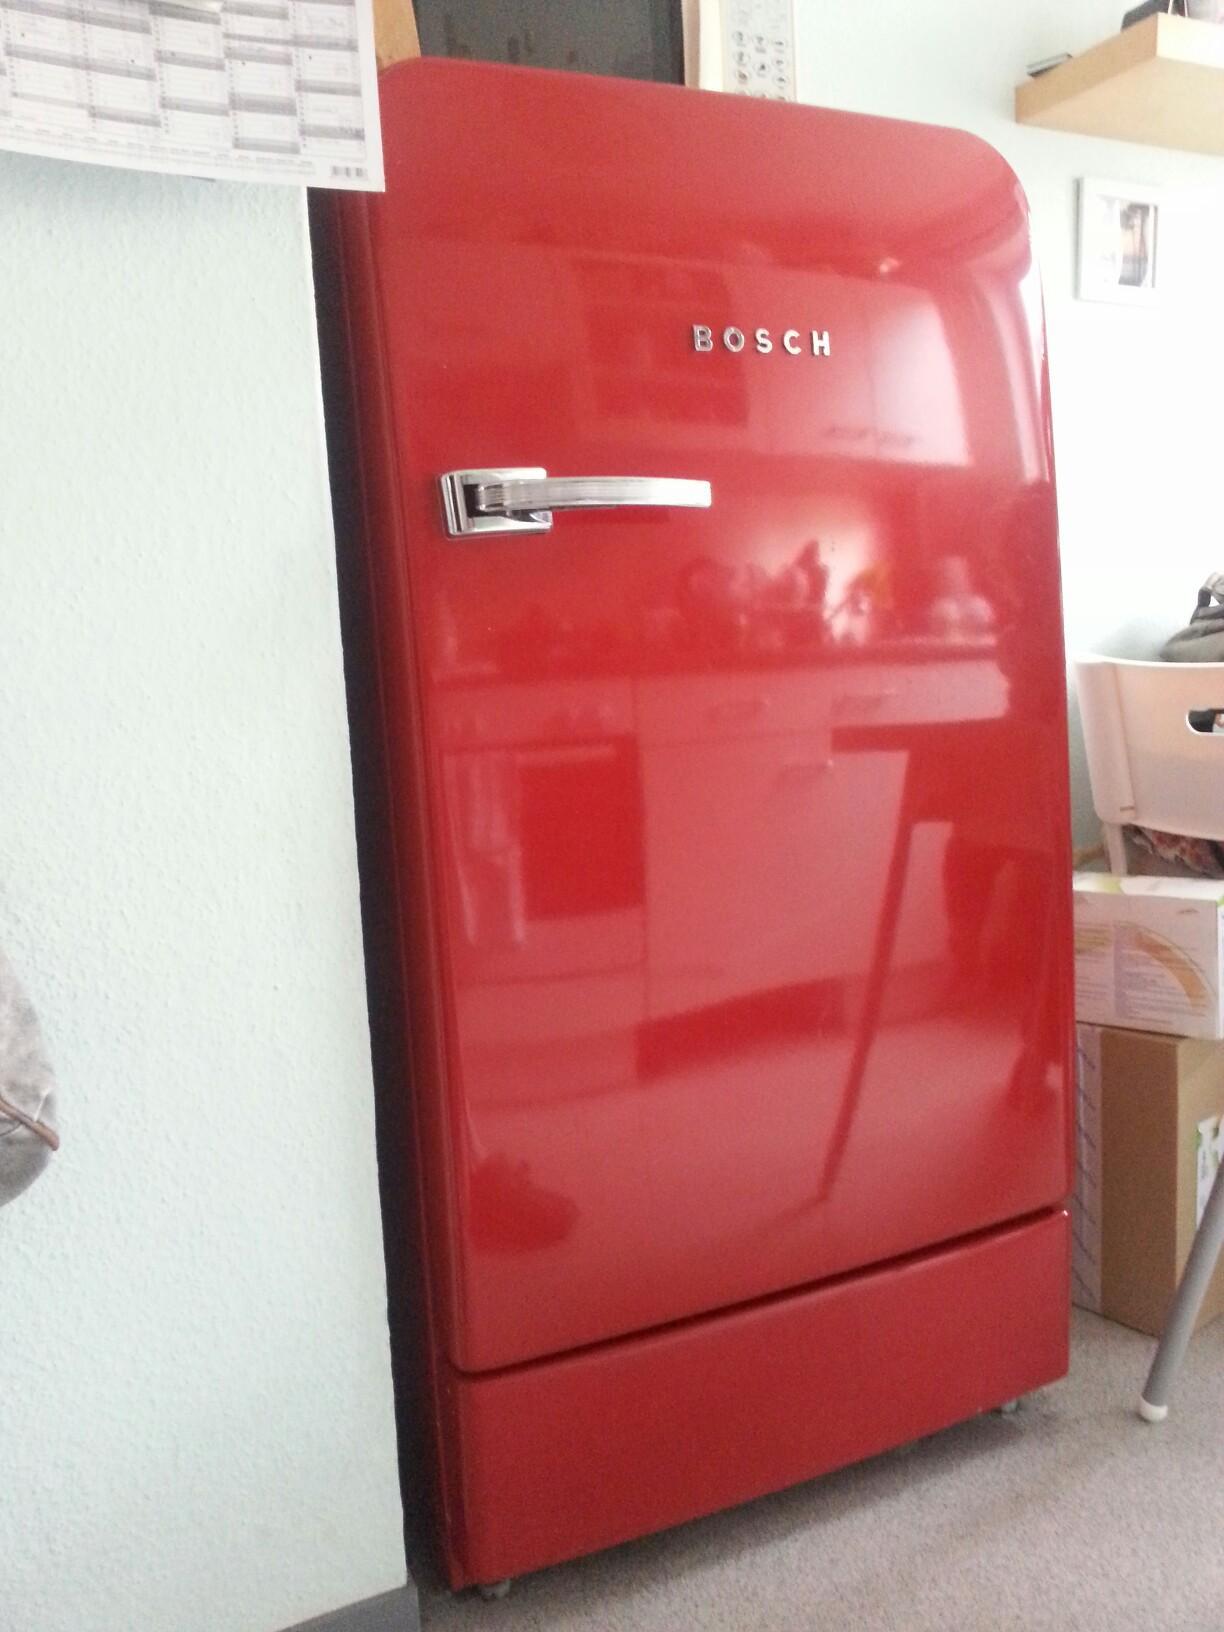 Bosch Oldschool Kühlschrank : Bosch oldschool kühlschrank: retro kühlschrank test die besten retro